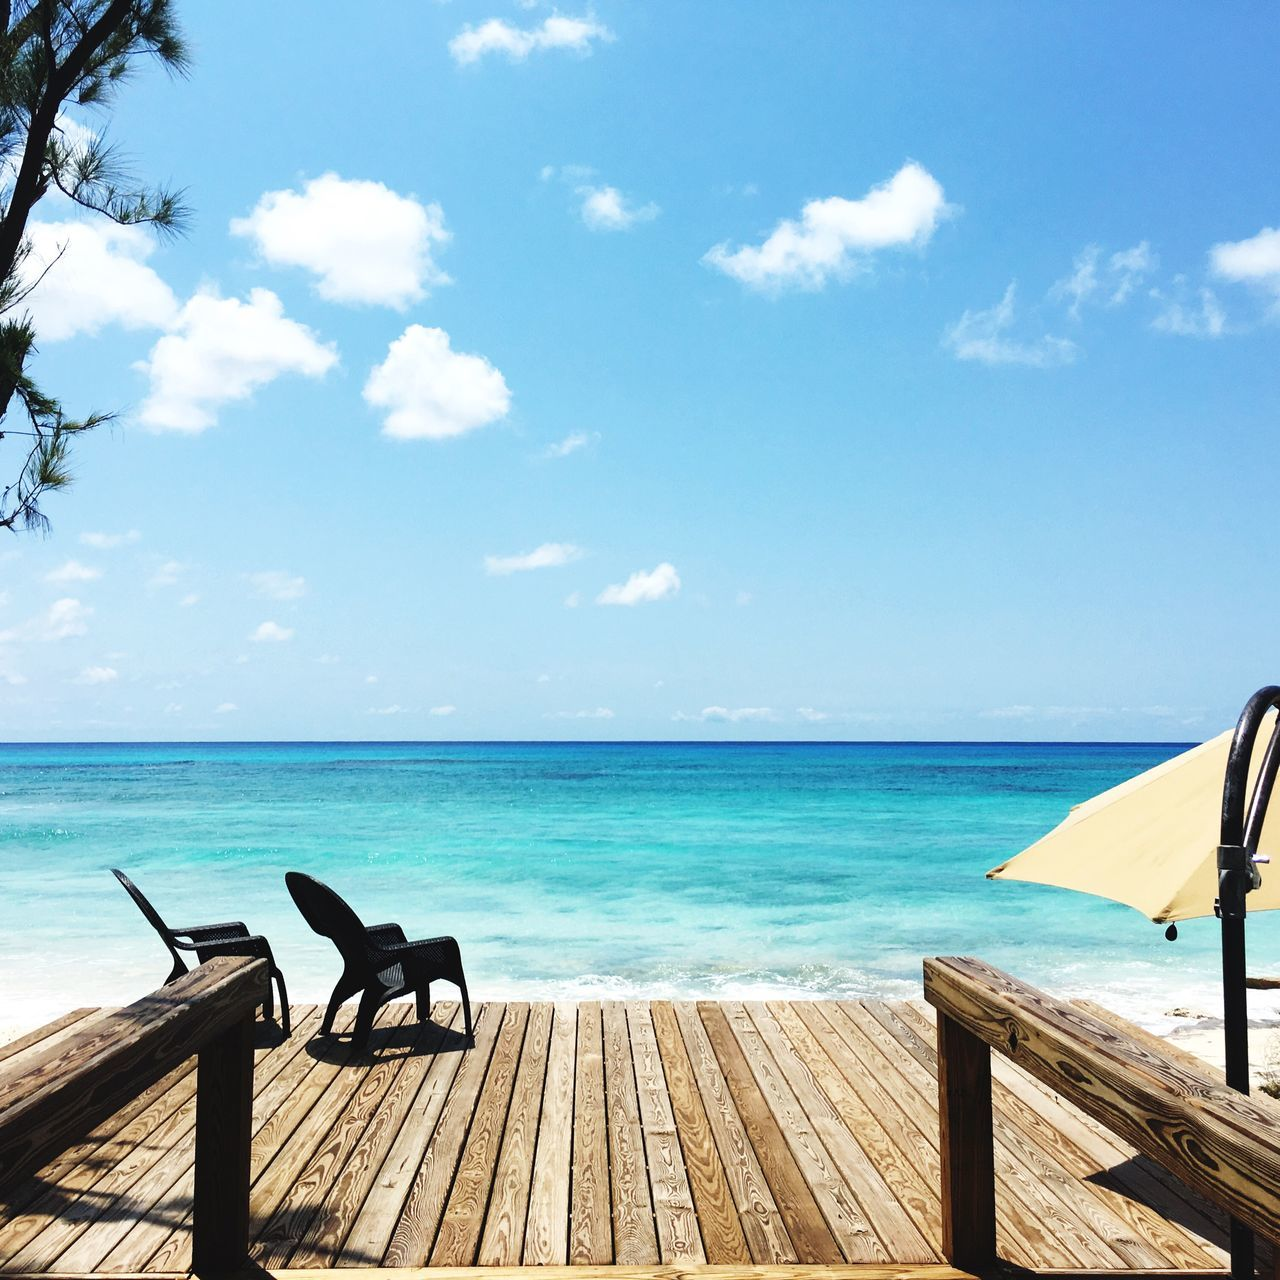 Beautiful stock photos of sonnenschein,  Beach,  Beauty In Nature,  Blue,  Cloud - Sky